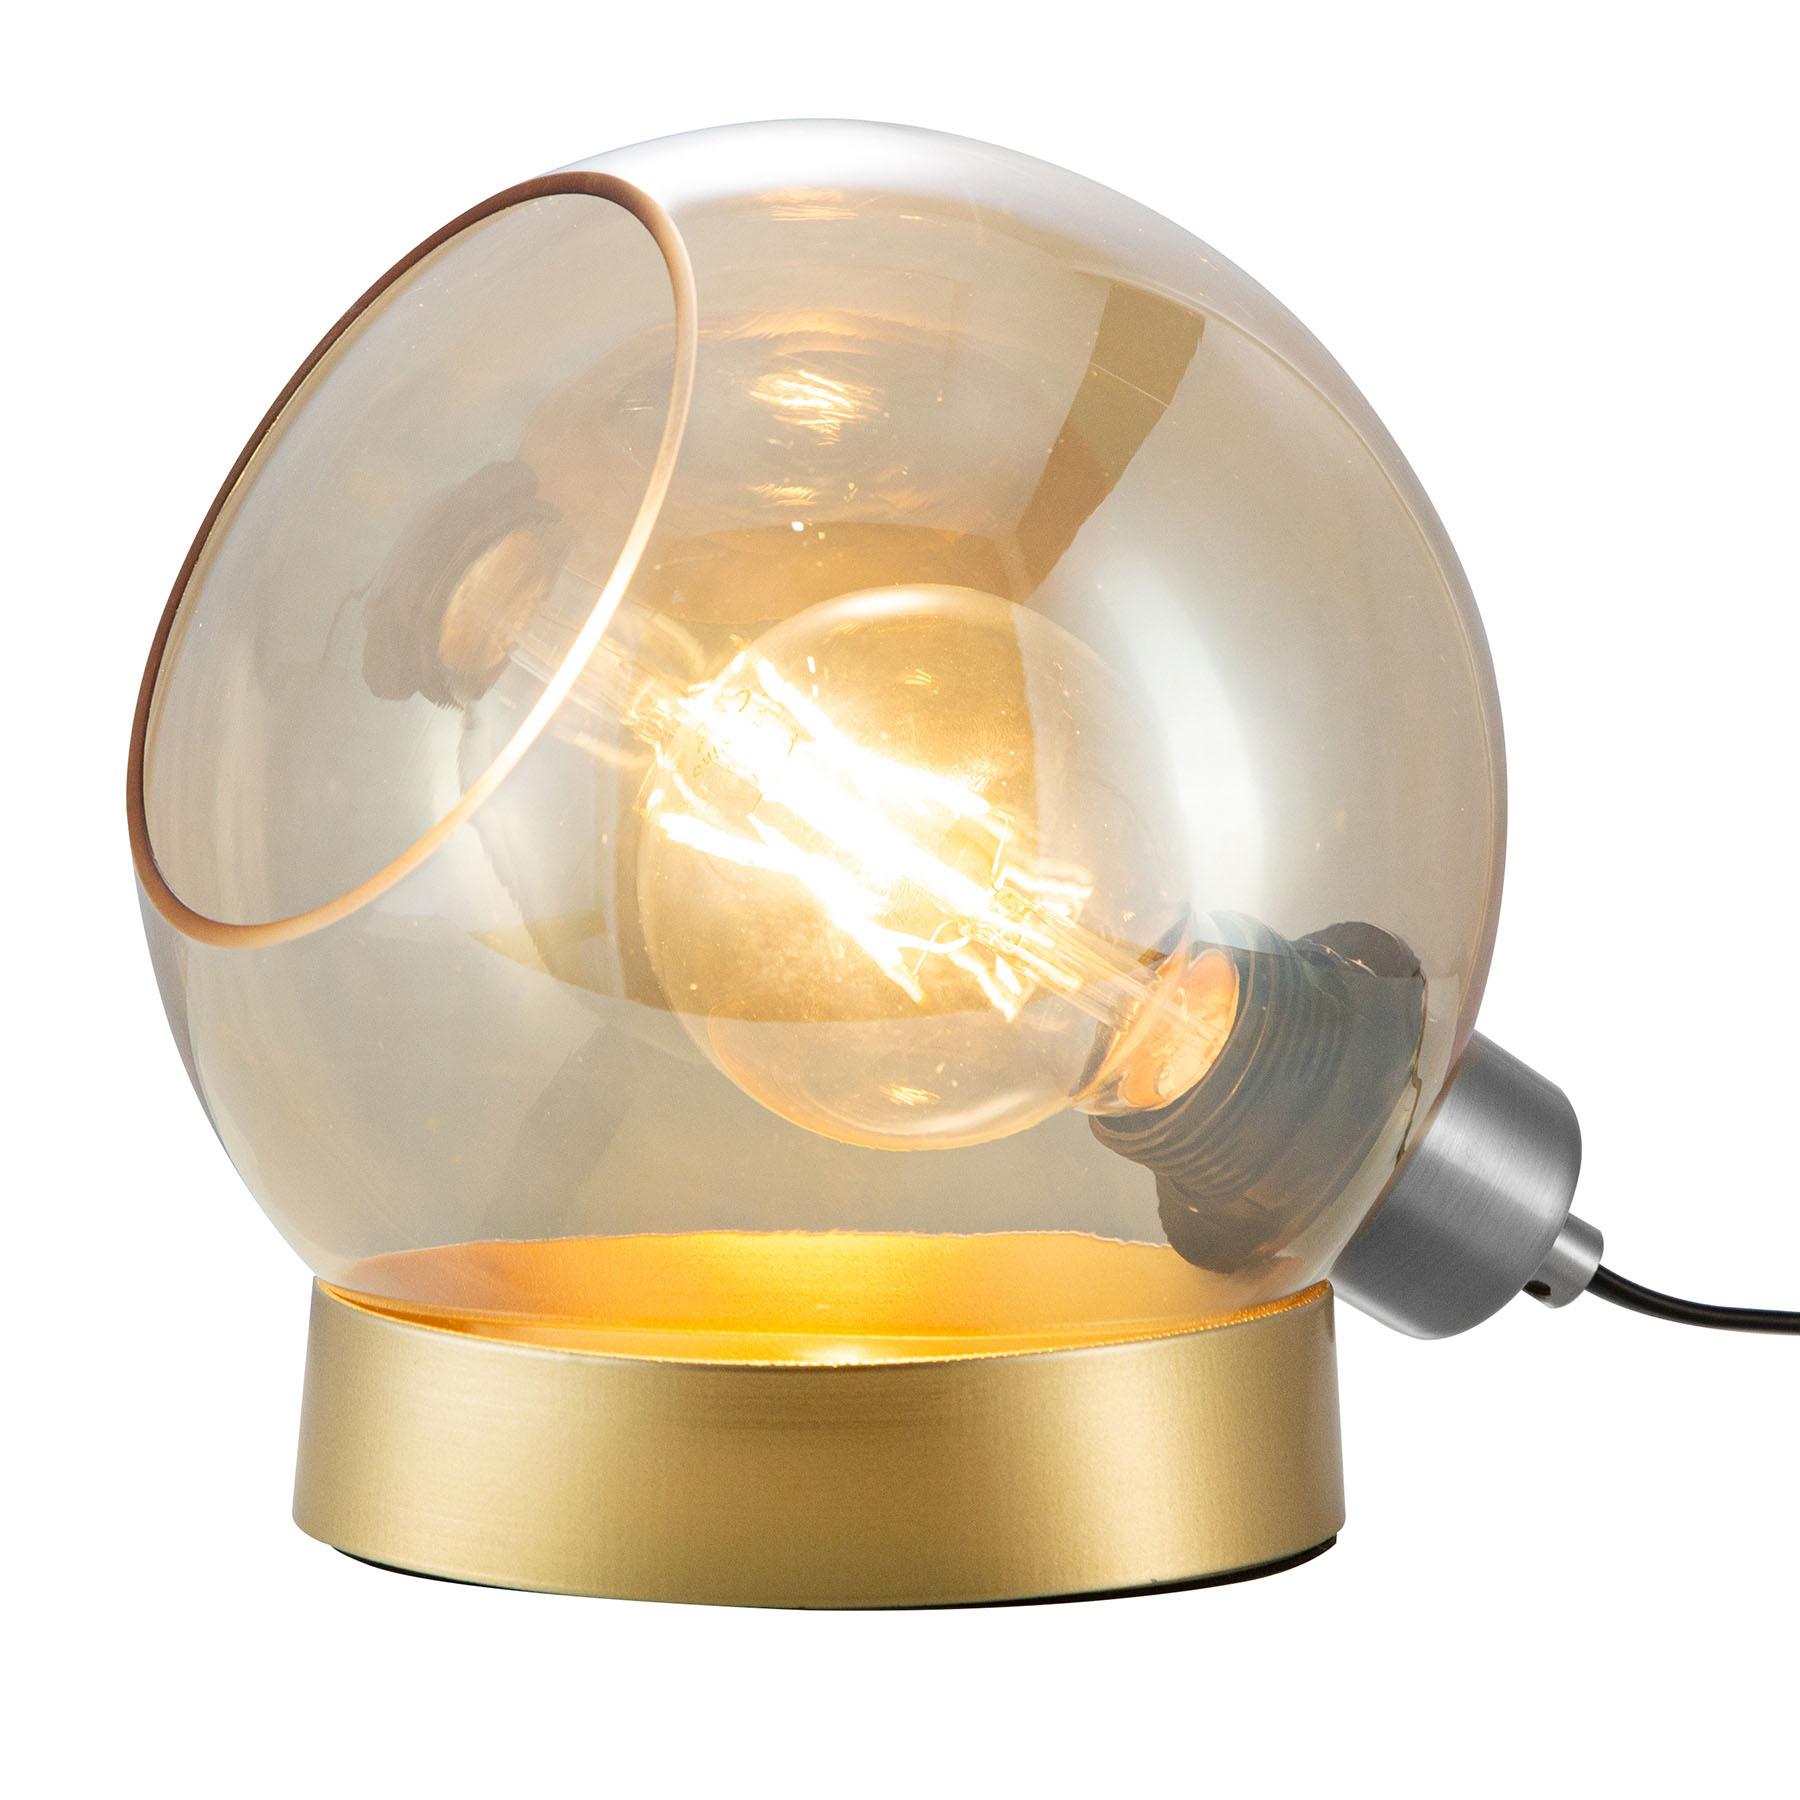 Tafellamp Toula, Ø 20 cm, glas amber